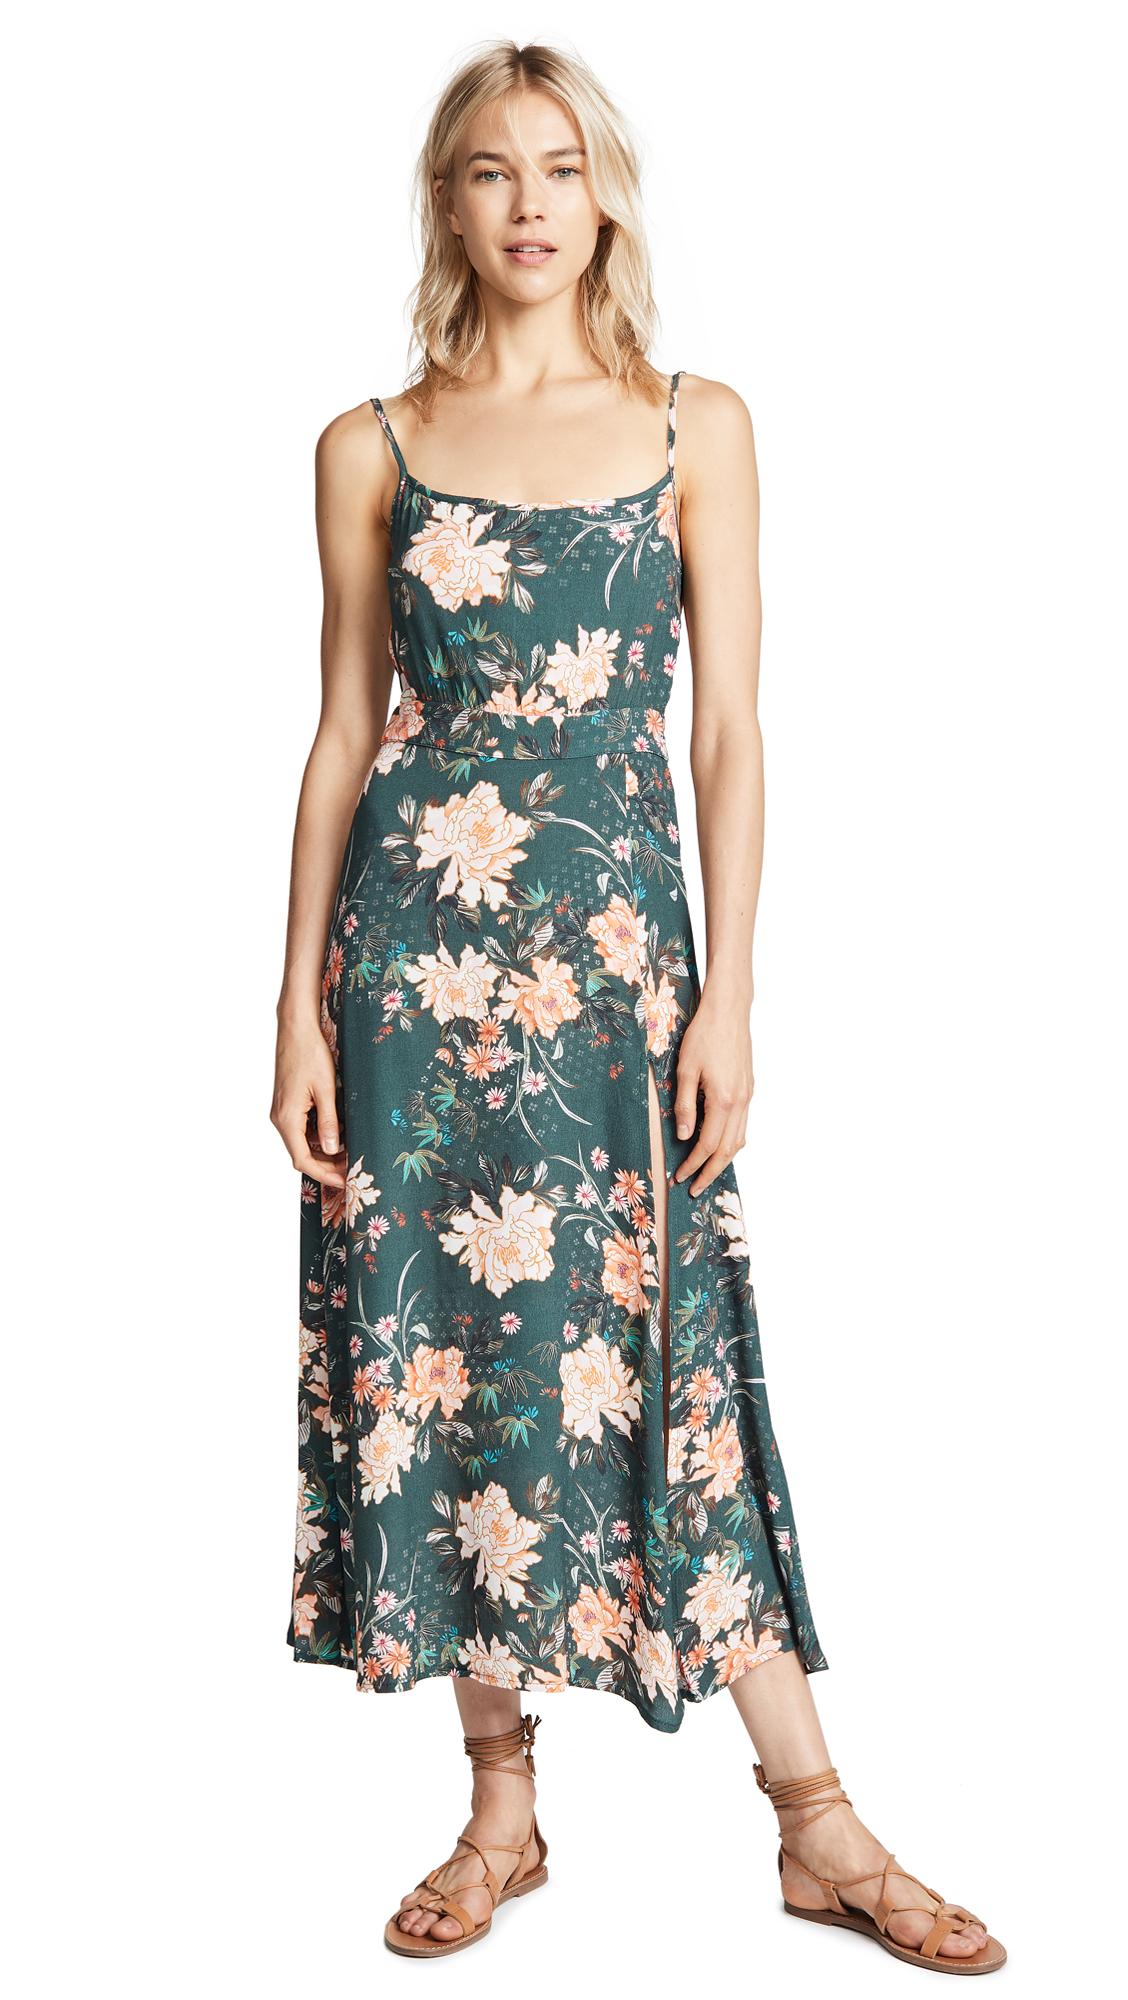 FLYNN SKYE Hazel Midi Dress in Abstract Emerald